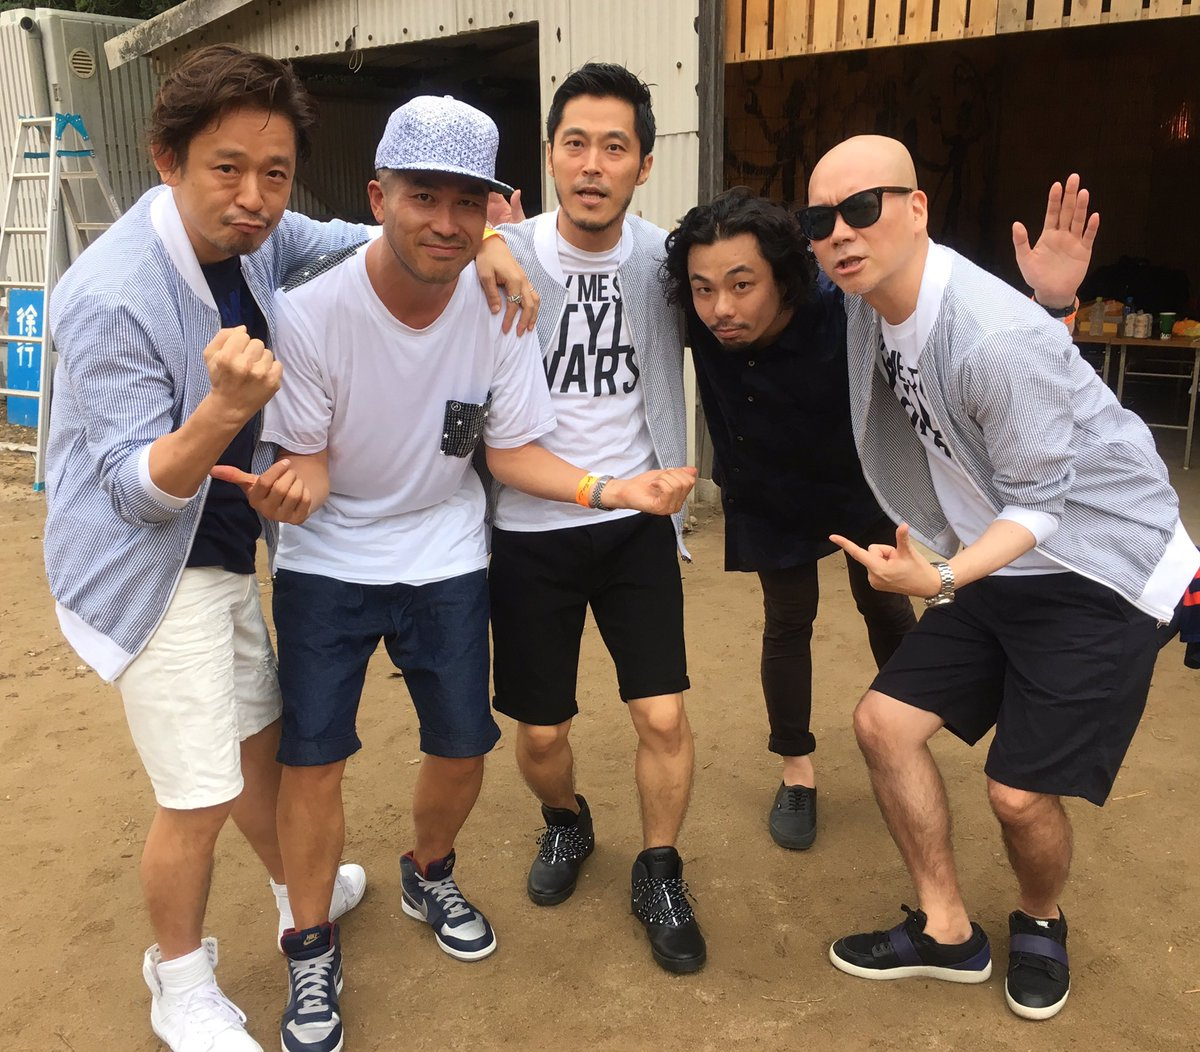 RHYMESTER × THA BLUE HERB。福岡サンセット・ライブ。 https://t.co/GtwgTQSHs3